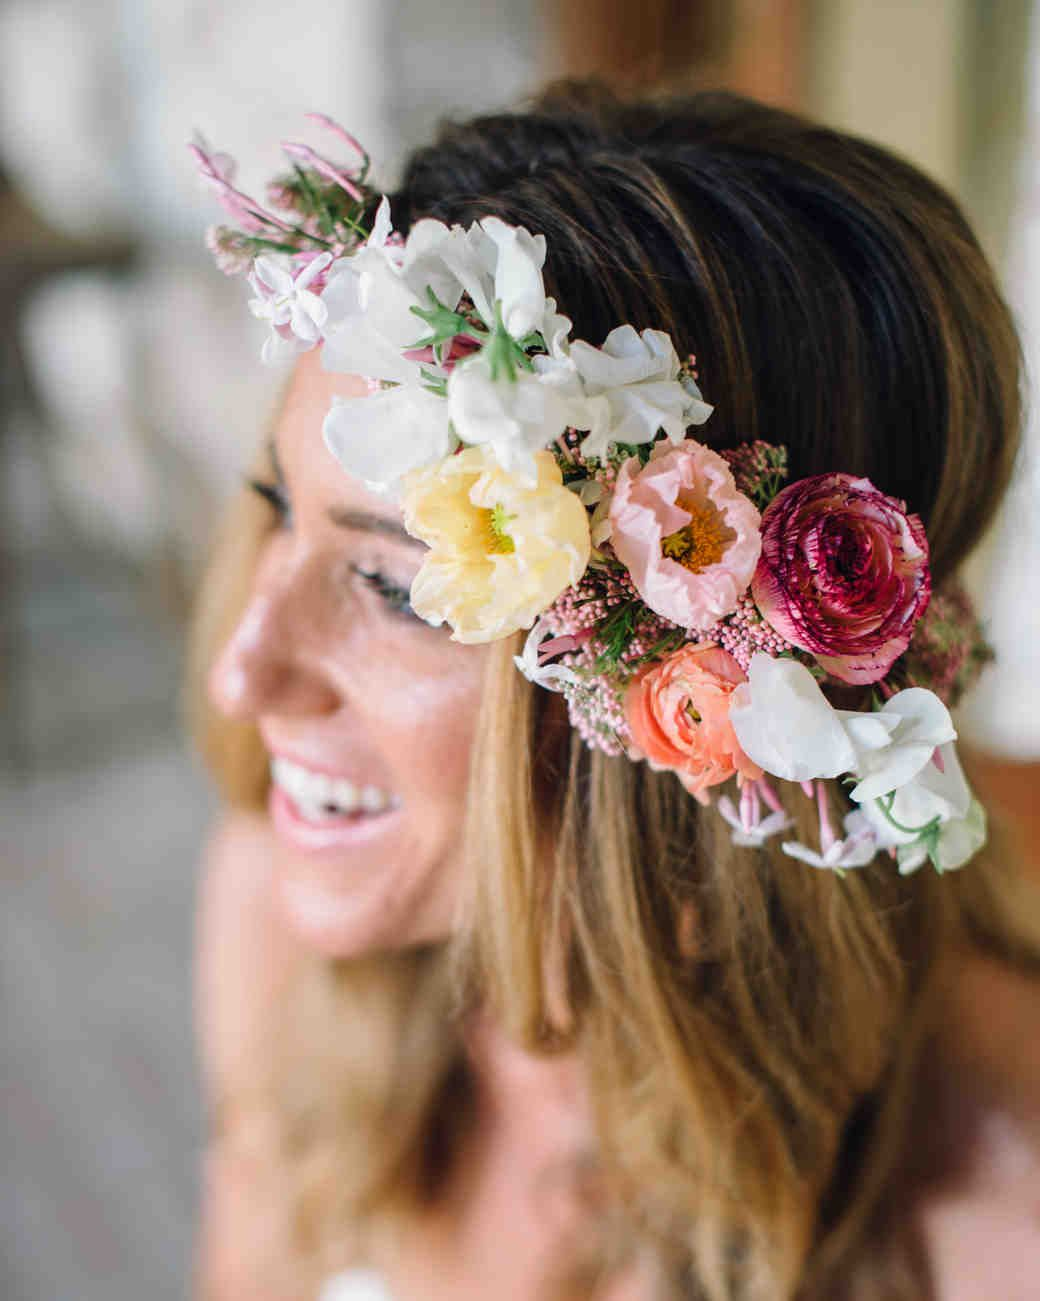 boho chic wedding ideas for free spirited brides and grooms martha